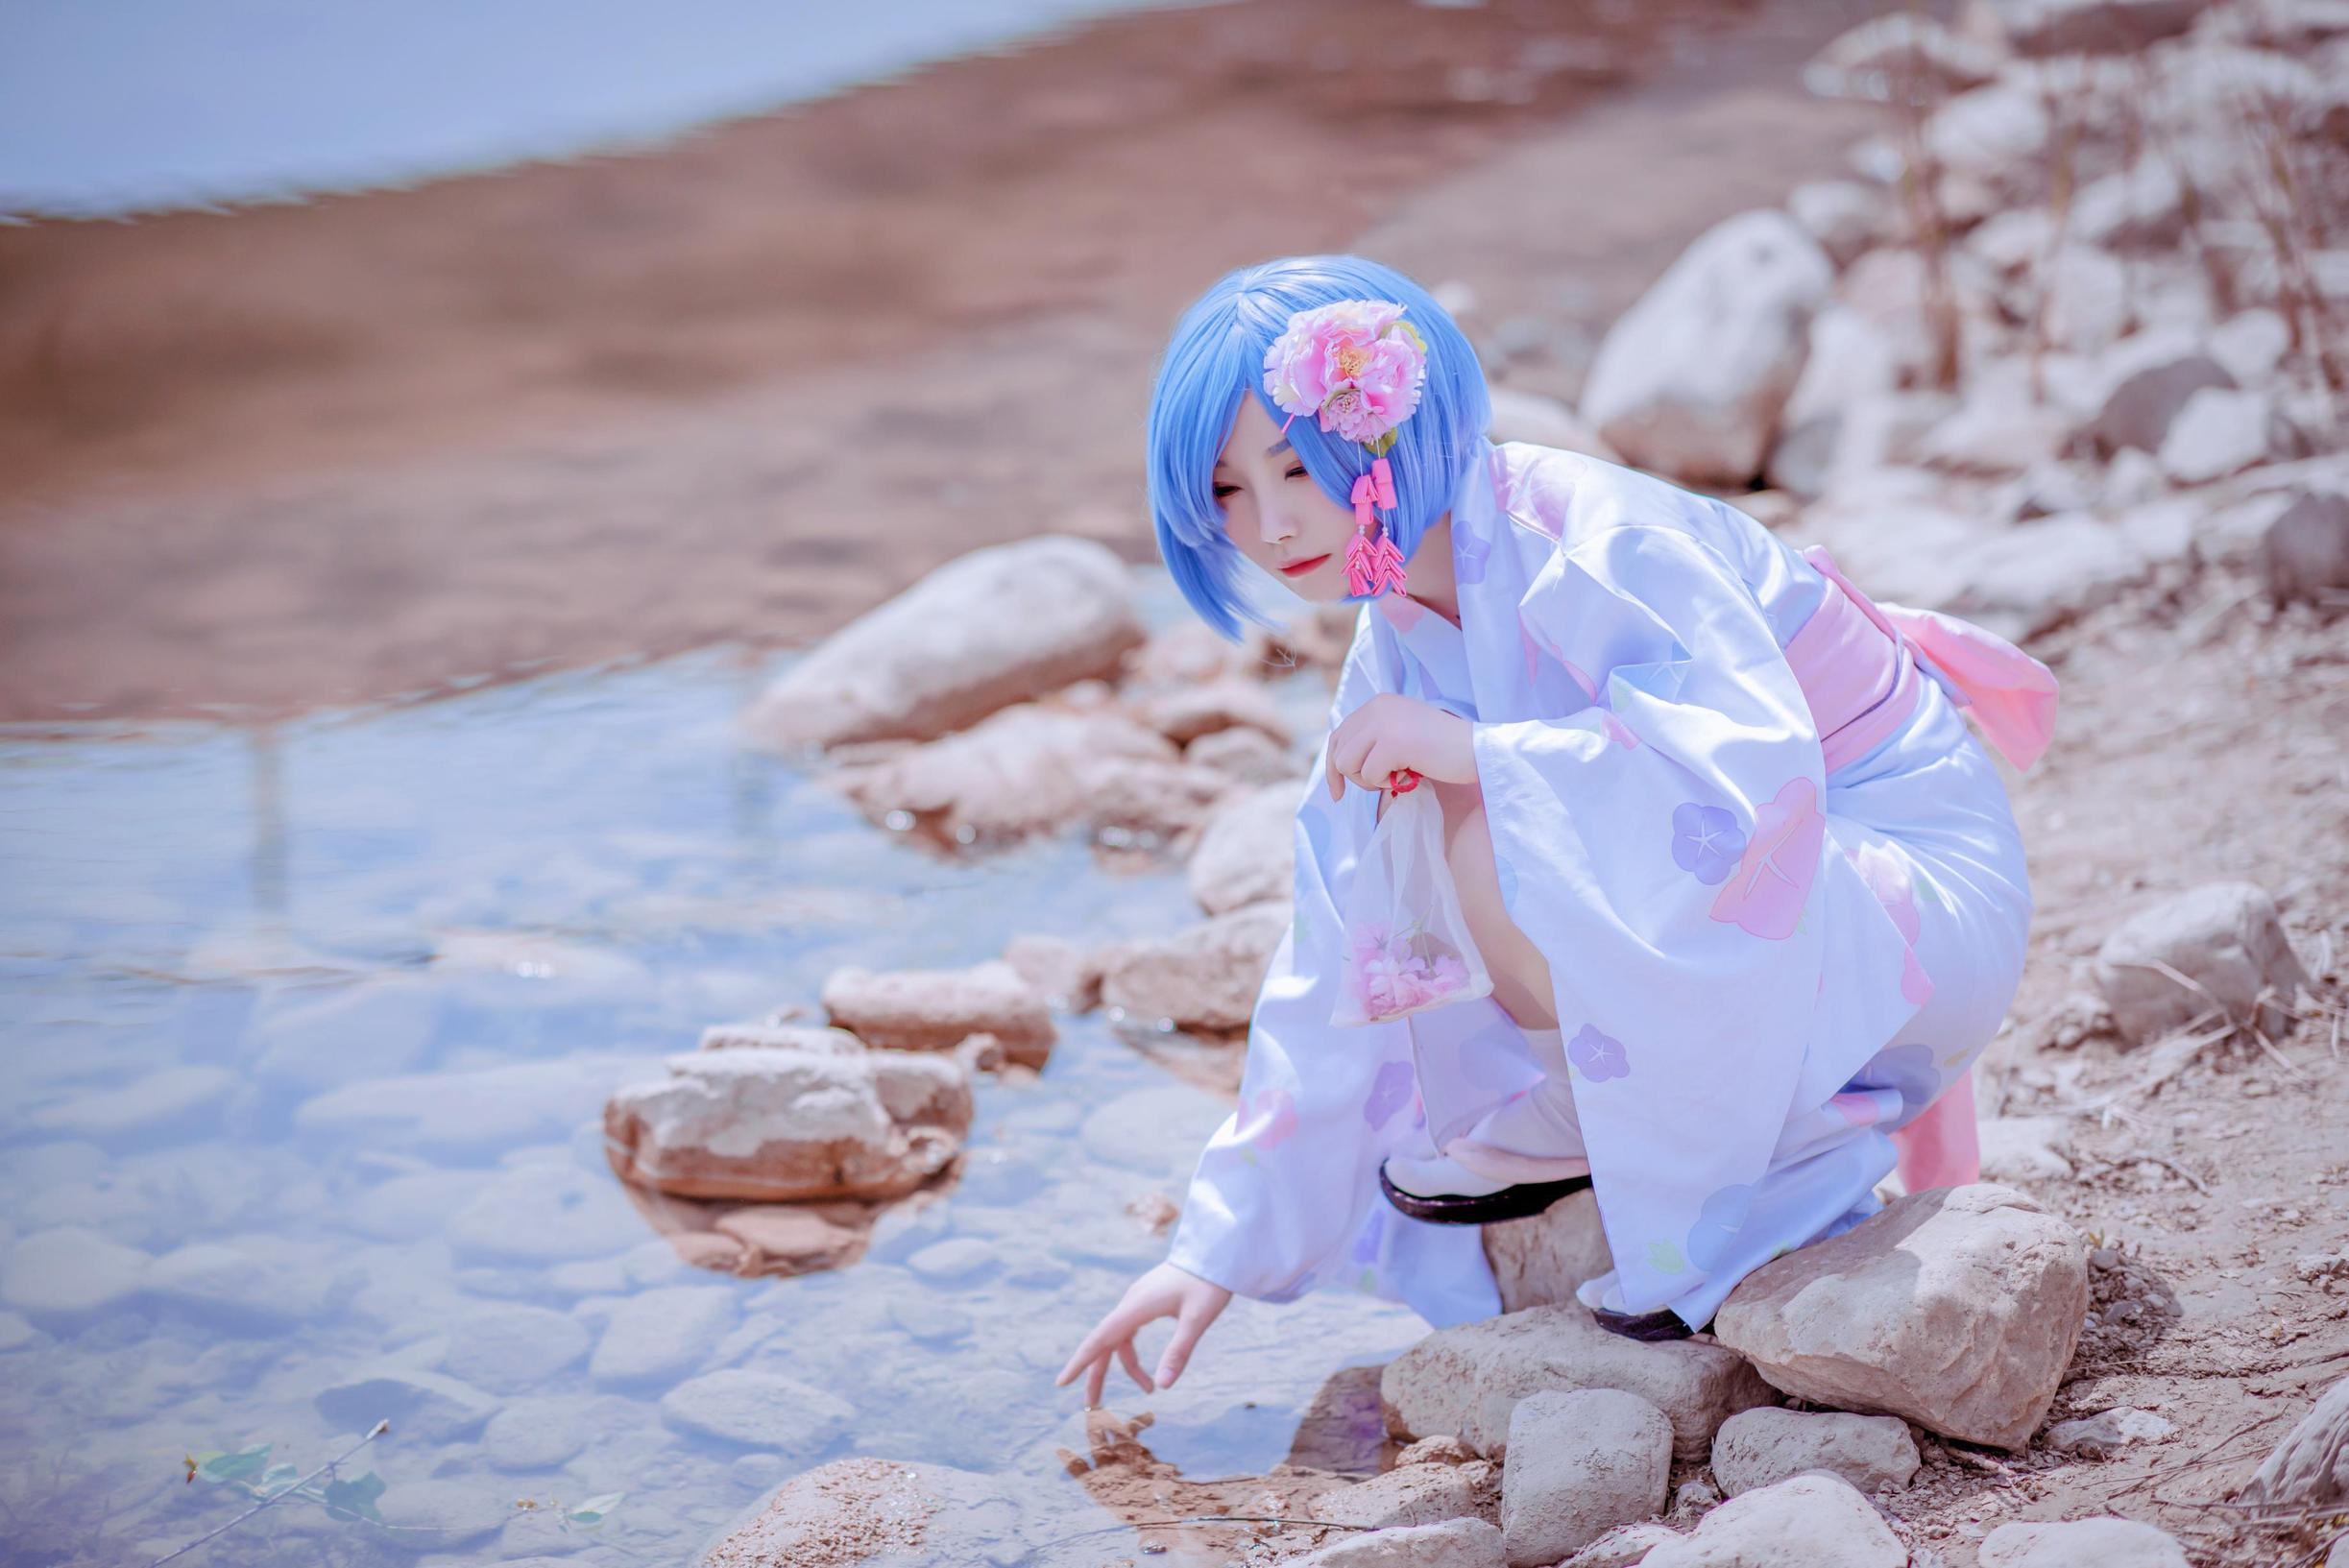 《RE:从零开始的异世界生活》推荐cosplay【CN:鱼栖YU】-第6张